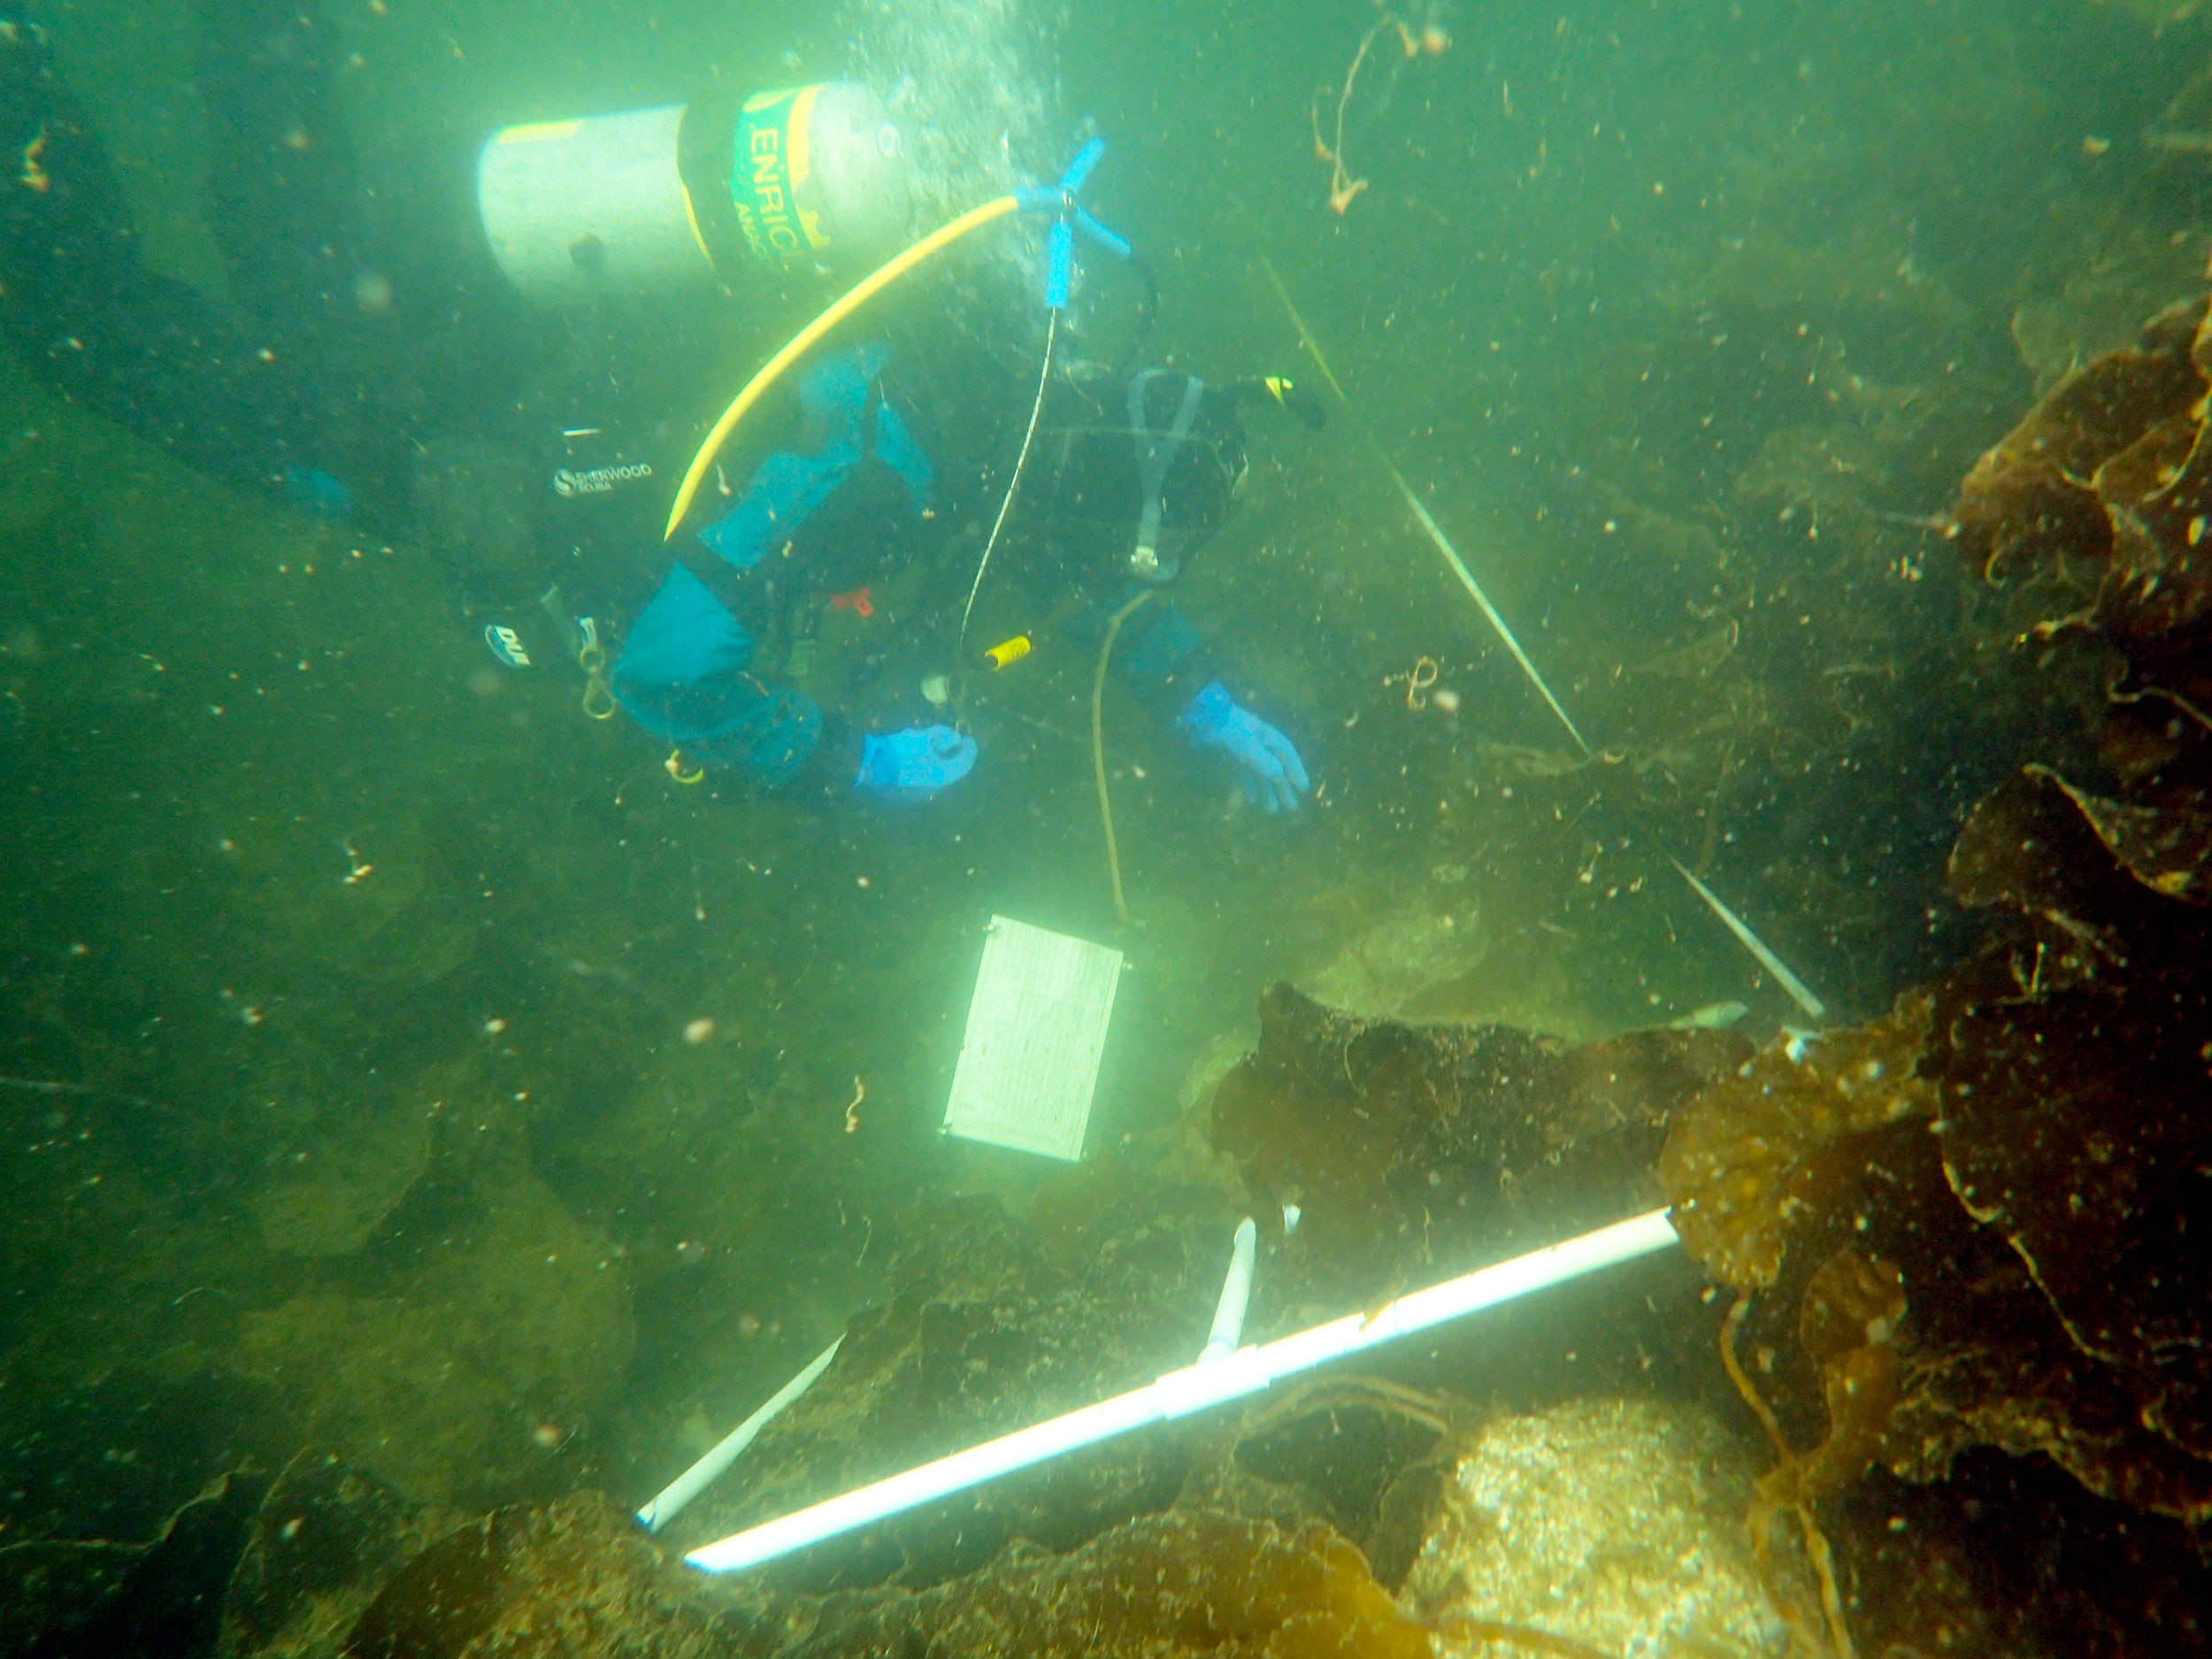 A Swinomish Fisheries biologist studies kelp beds on a clam garden wall. Photo: Yann Herrera-Fuchs